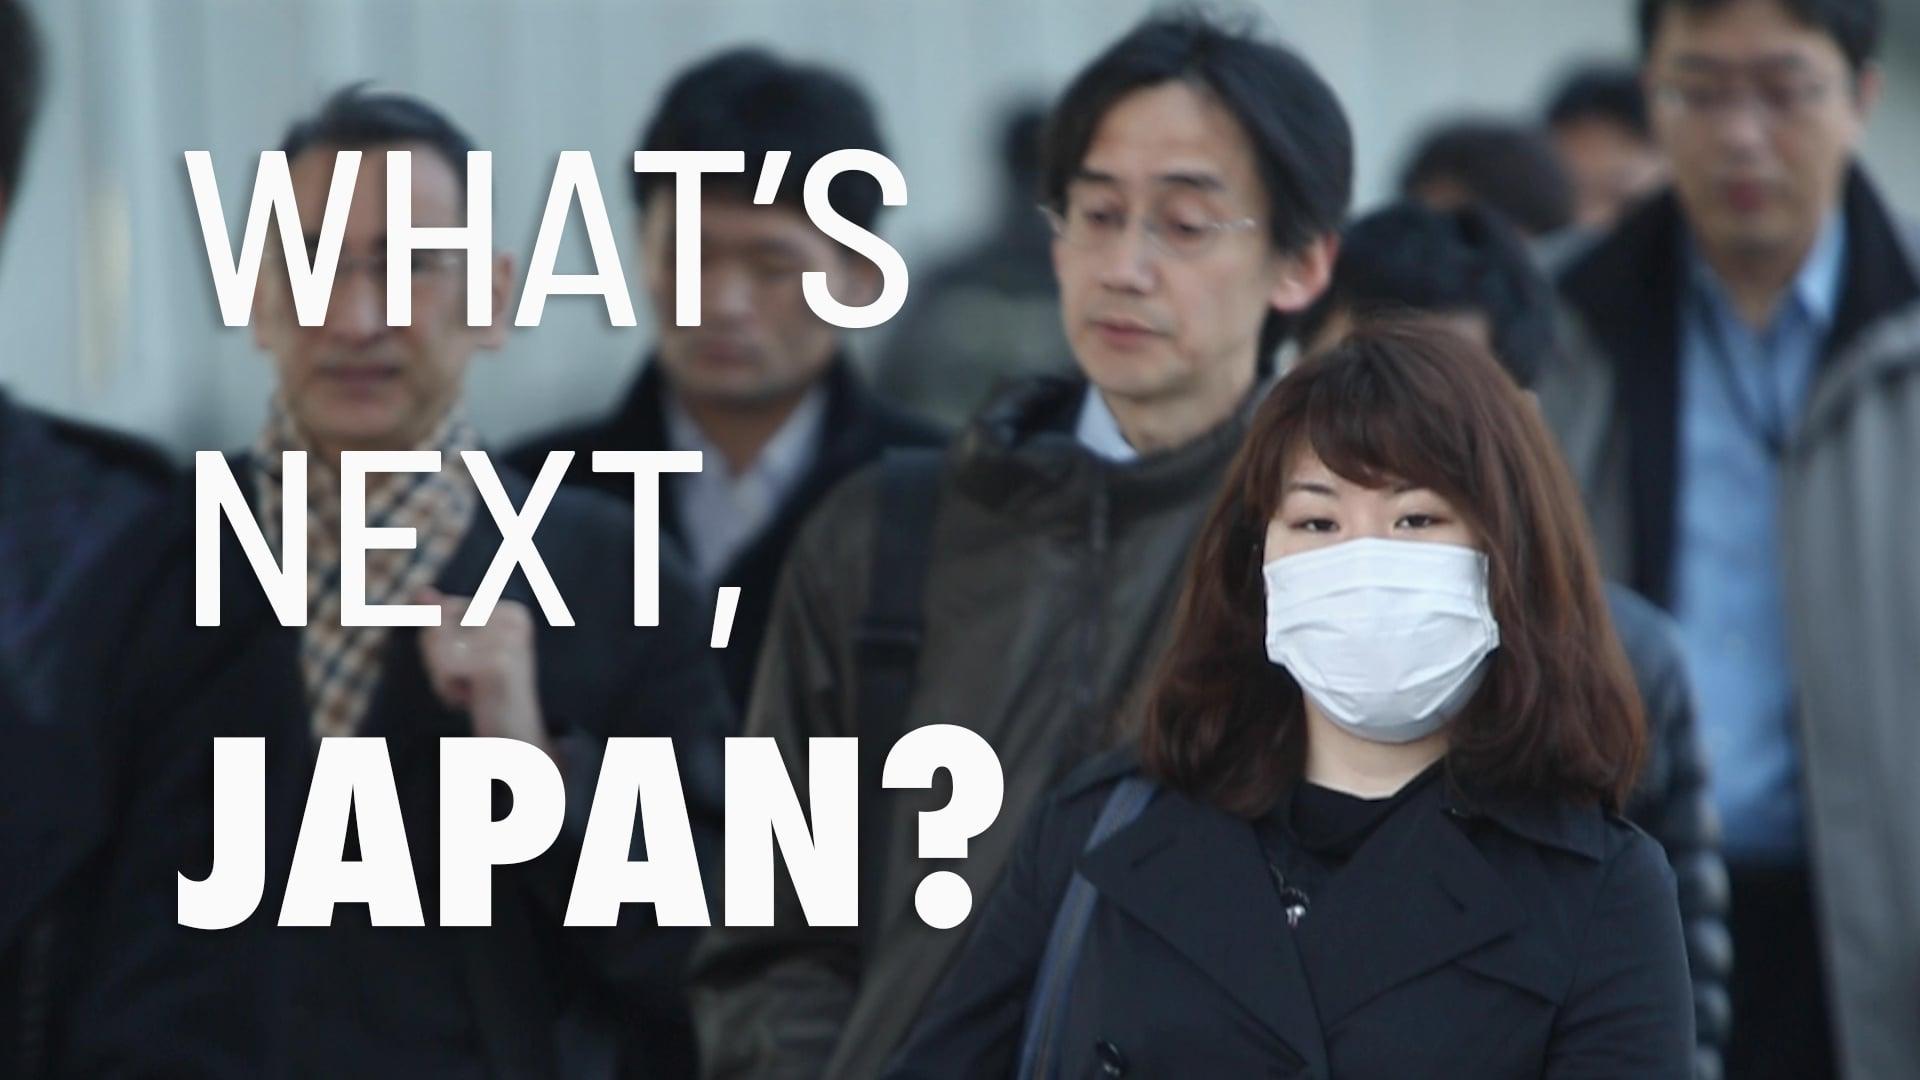 What next, Japan?